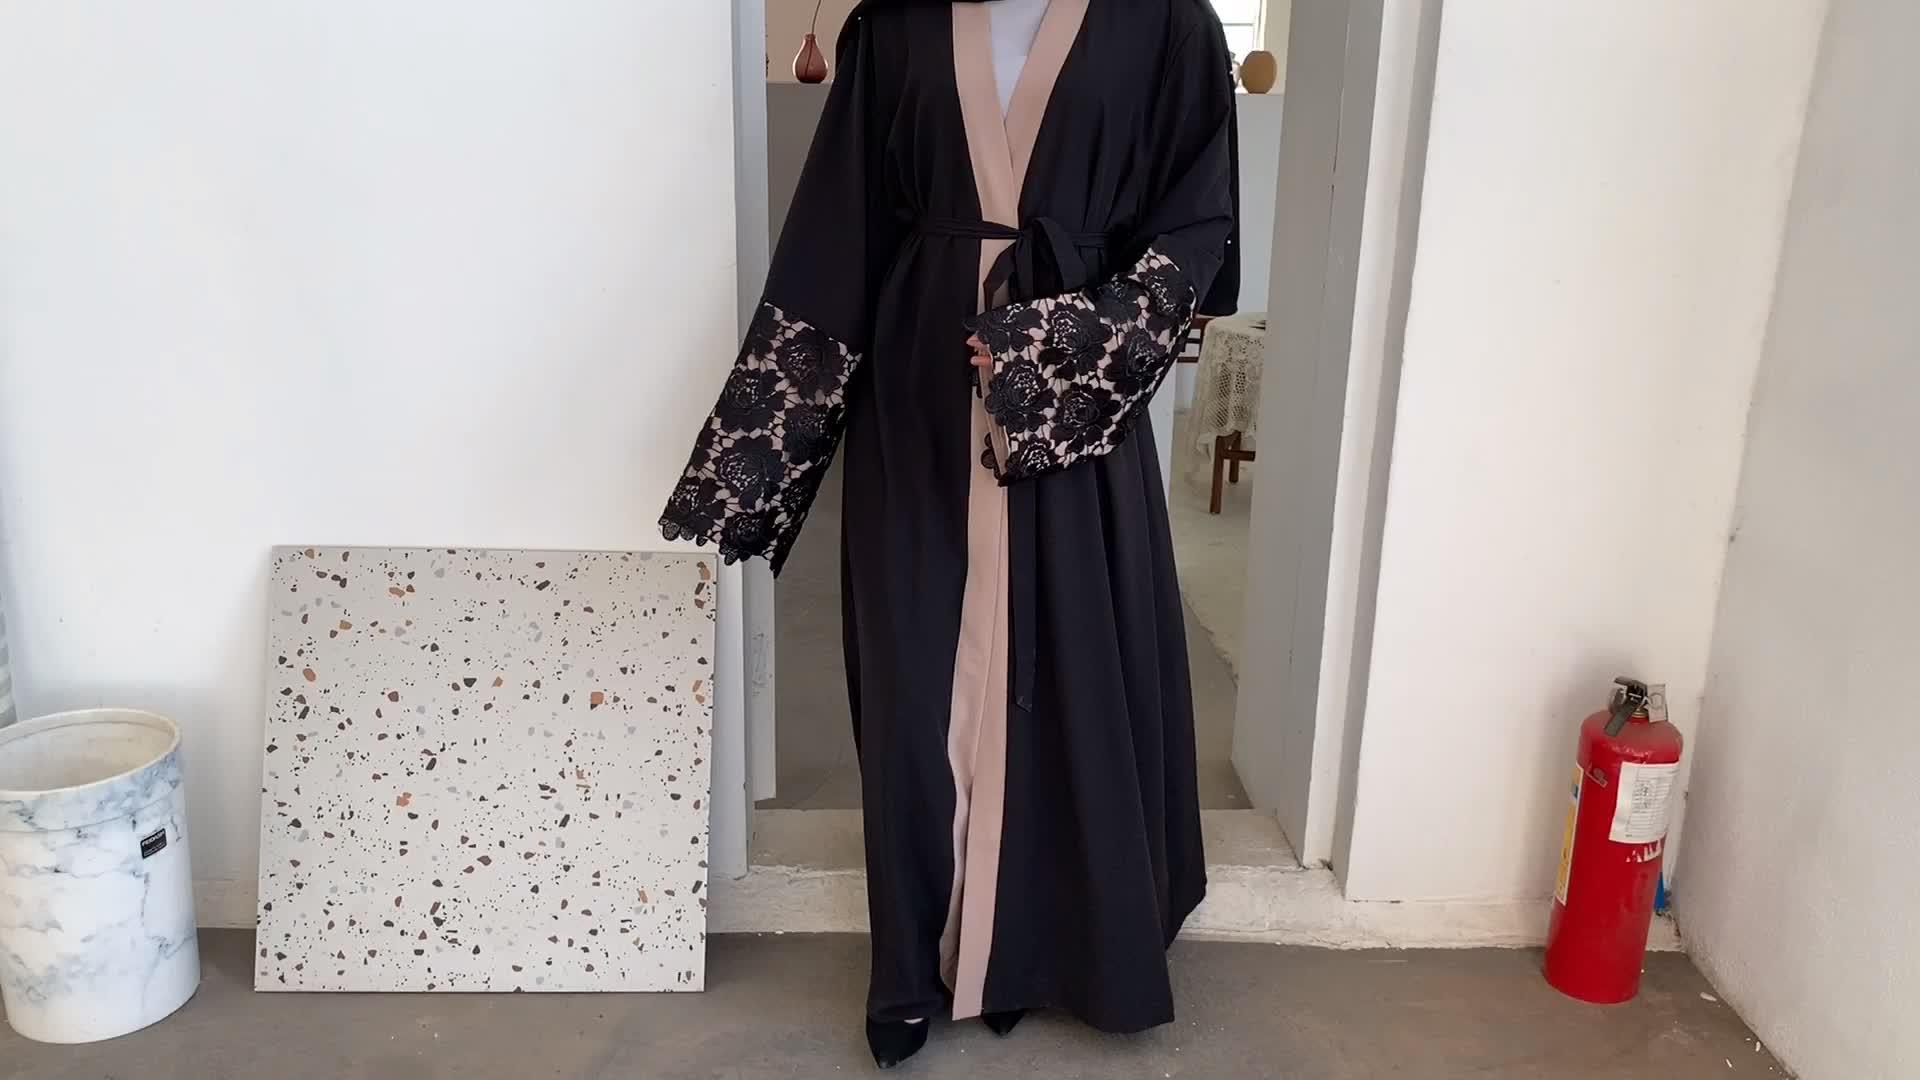 1502 #2019 Terbaru Desain Baru Bordir Cardigan Pakaian Fashion Depan Terbuka Kimono Gaya Arab Dubai Muslim Abaya